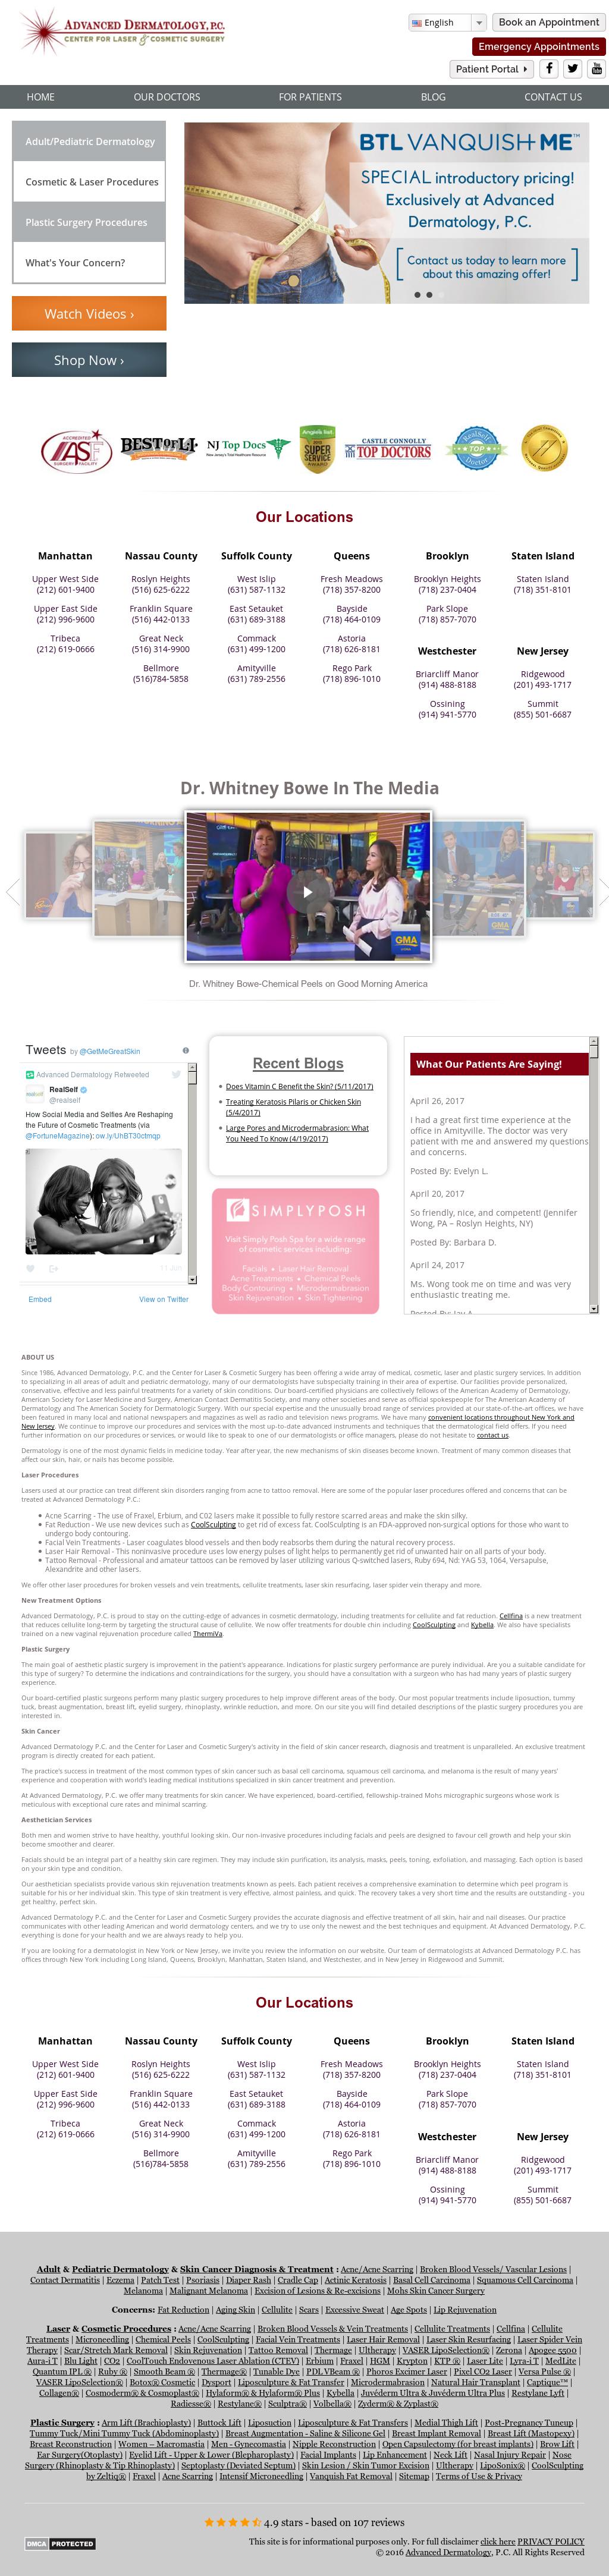 Advanceddermatologypc Competitors, Revenue and Employees